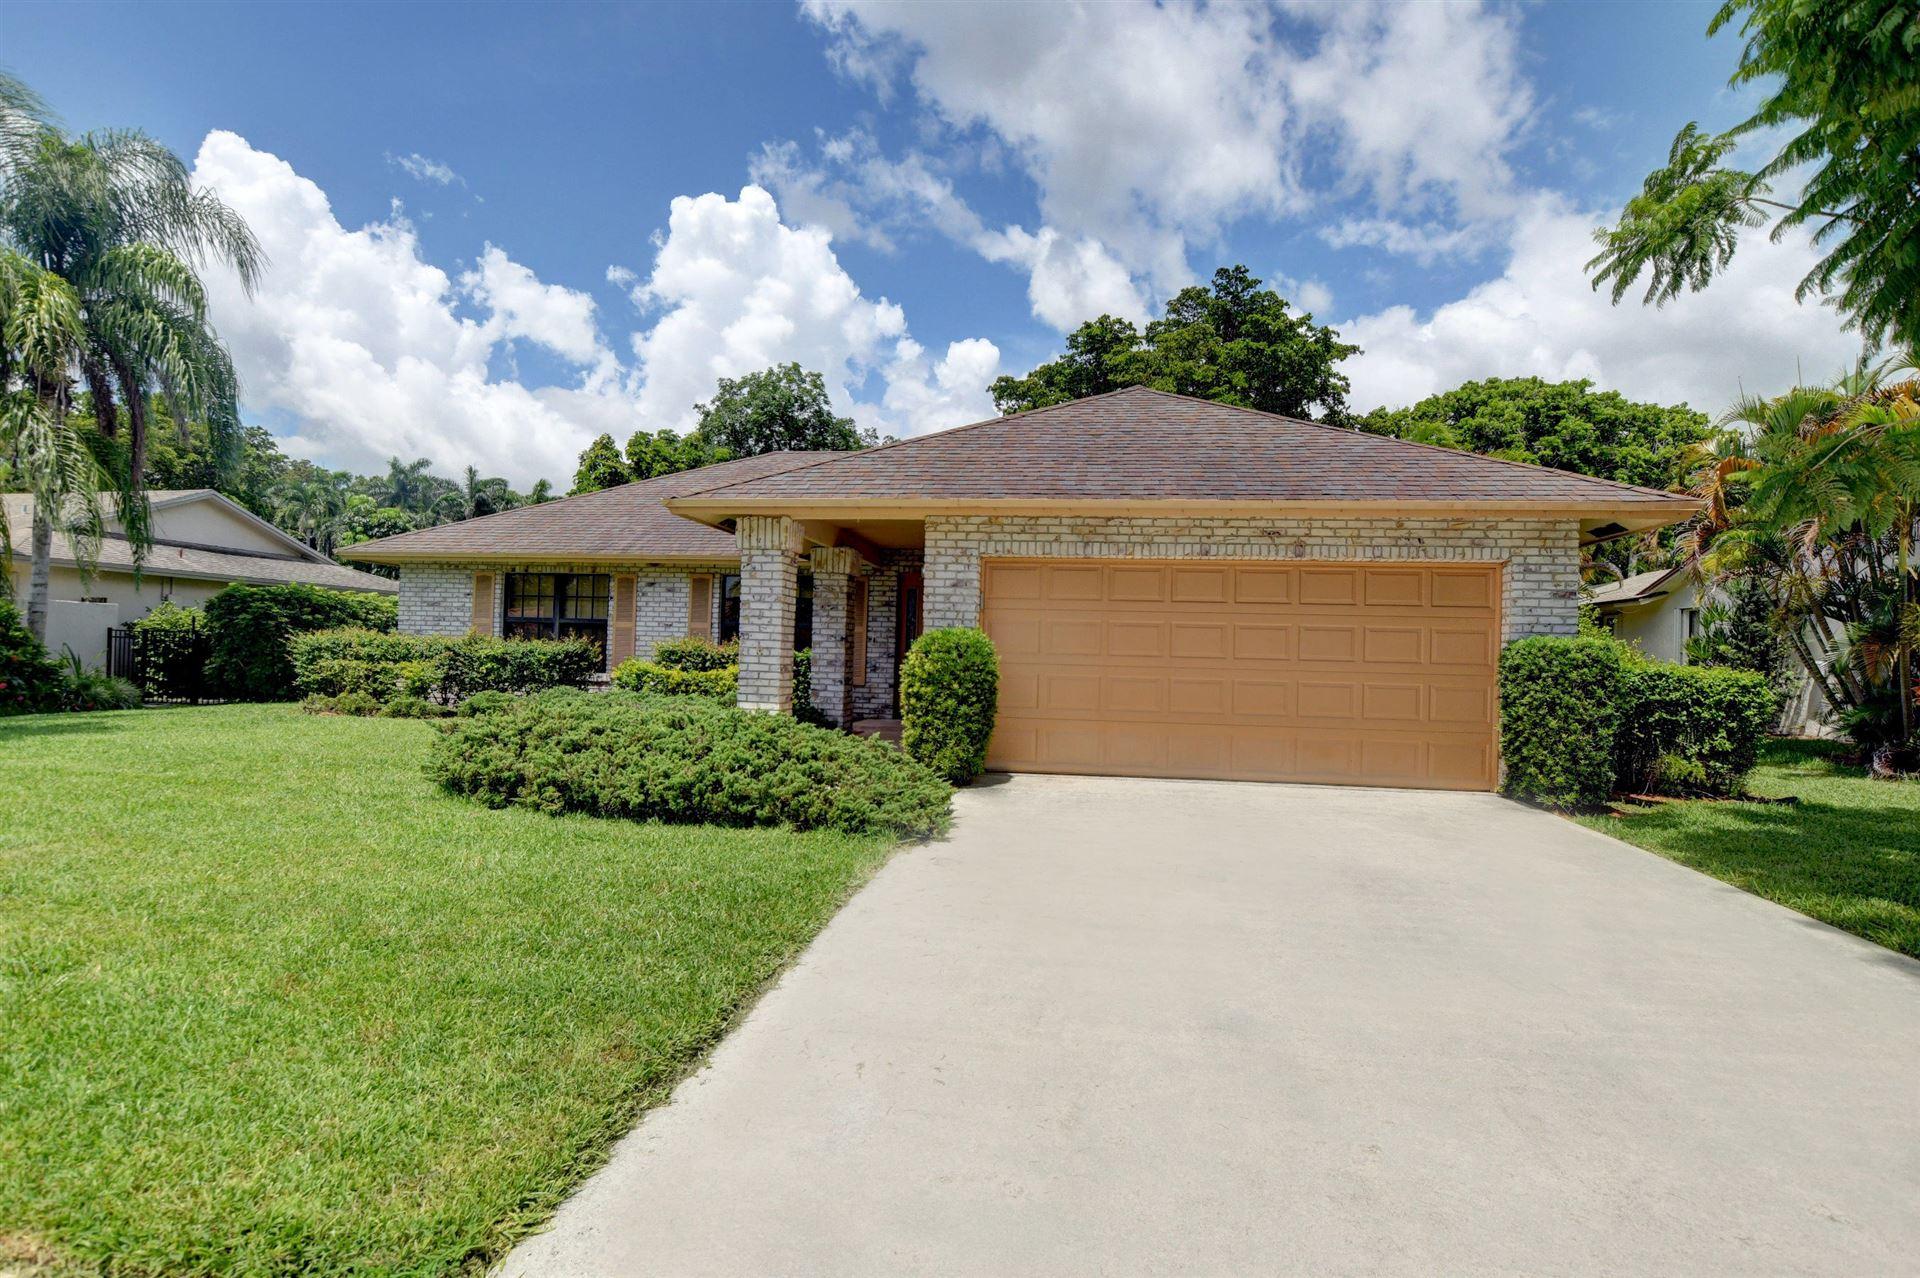 20858 Sugarloaf Lane, Boca Raton, FL 33428 - MLS#: RX-10732755